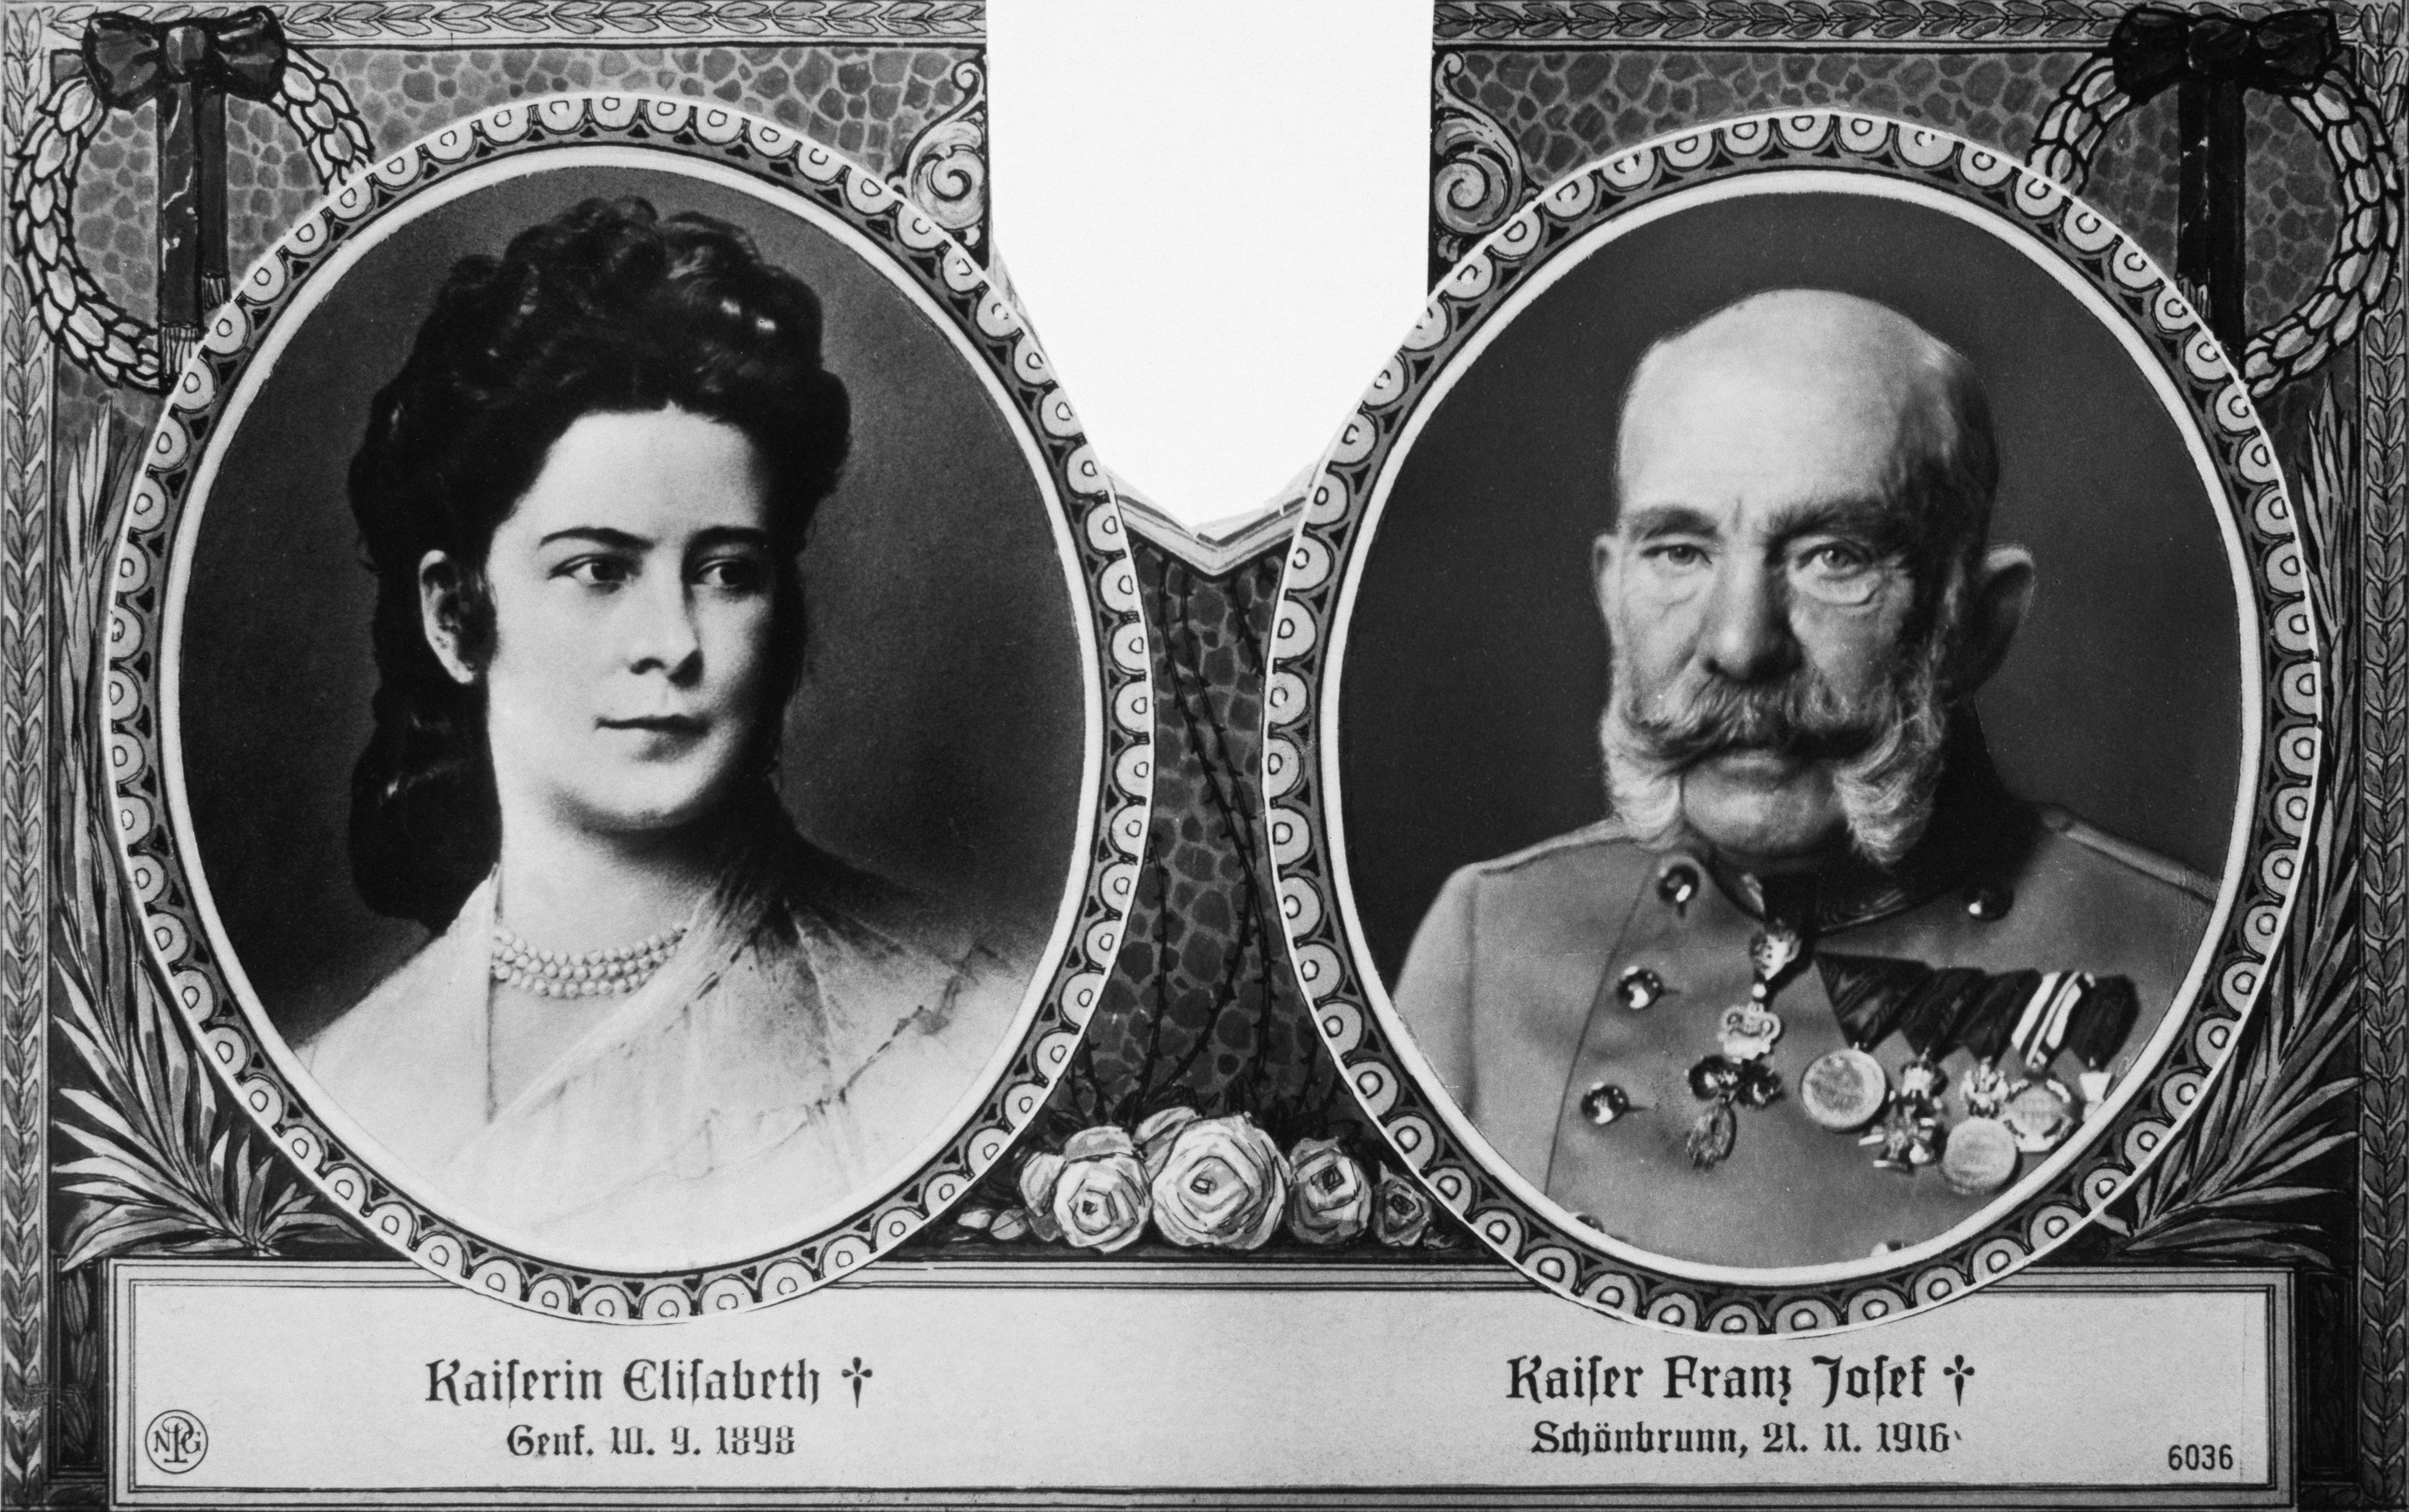 Emperor Franz Joseph, and his wife Empress Elisabeth, of Austria. (Credit: DeAgostini/Getty Images)